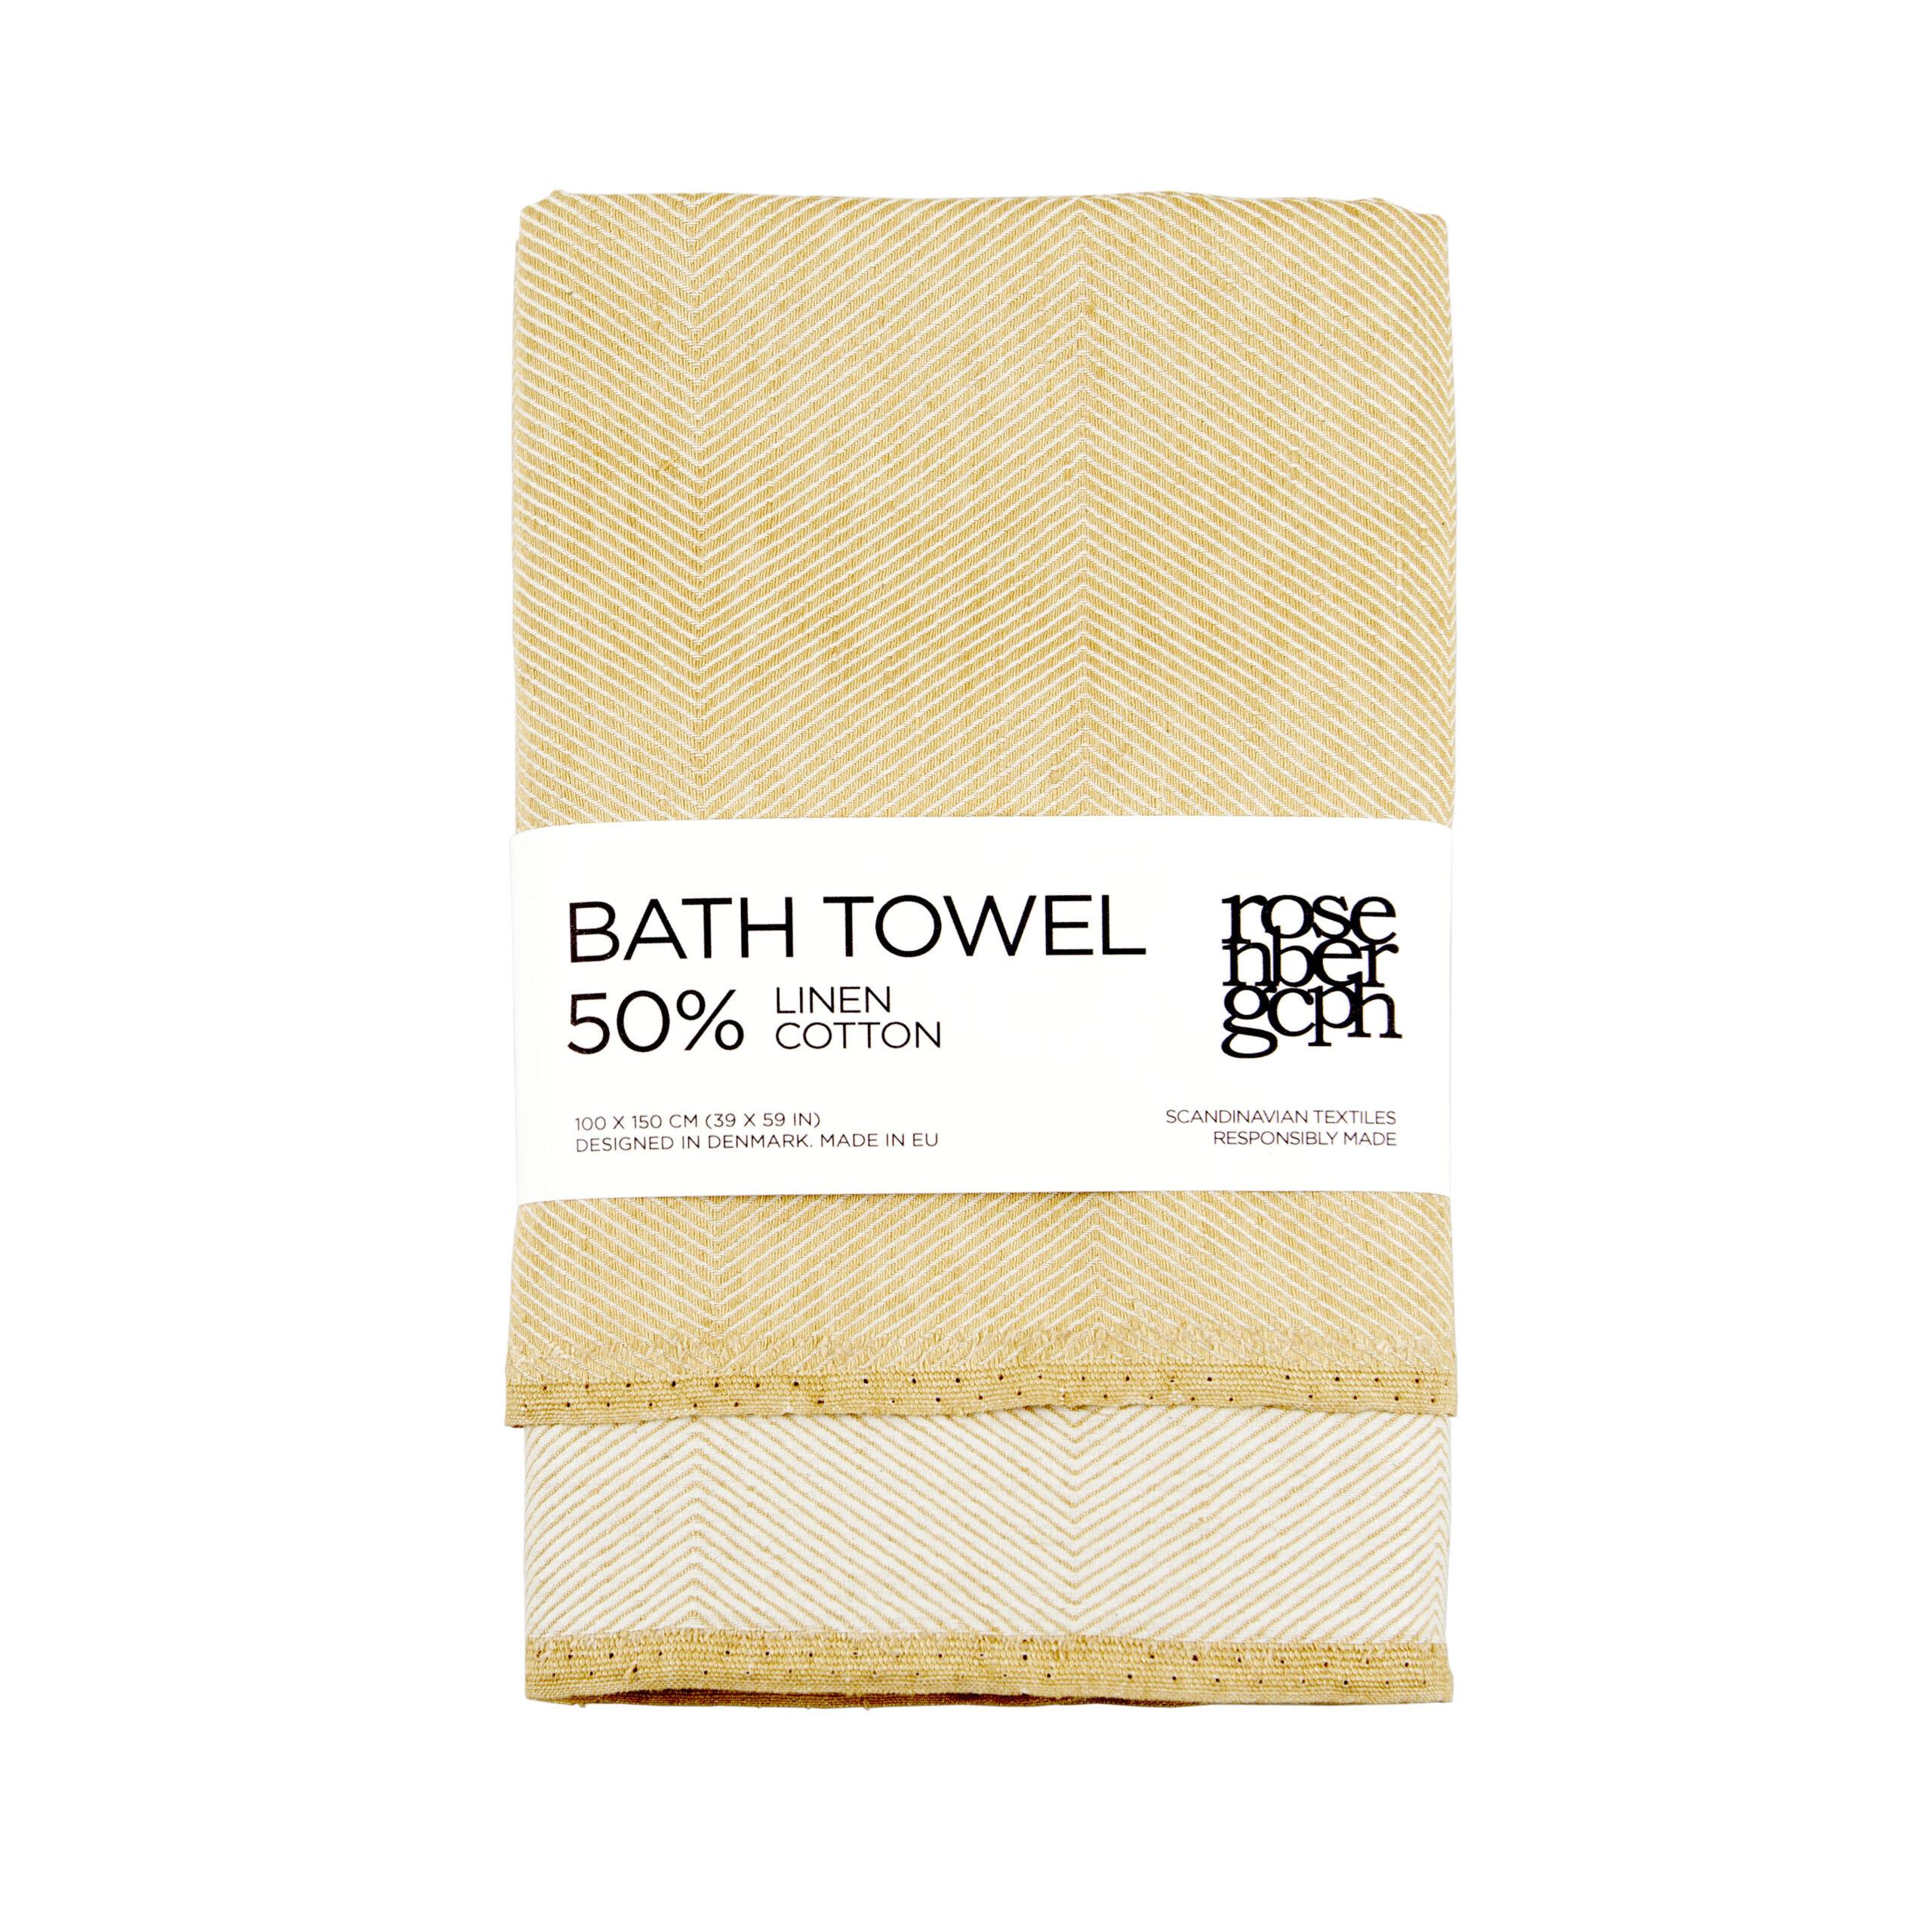 Bath towel, hay yellow, linen/cotton, design by Anne Rosenberg, RosenbergCph